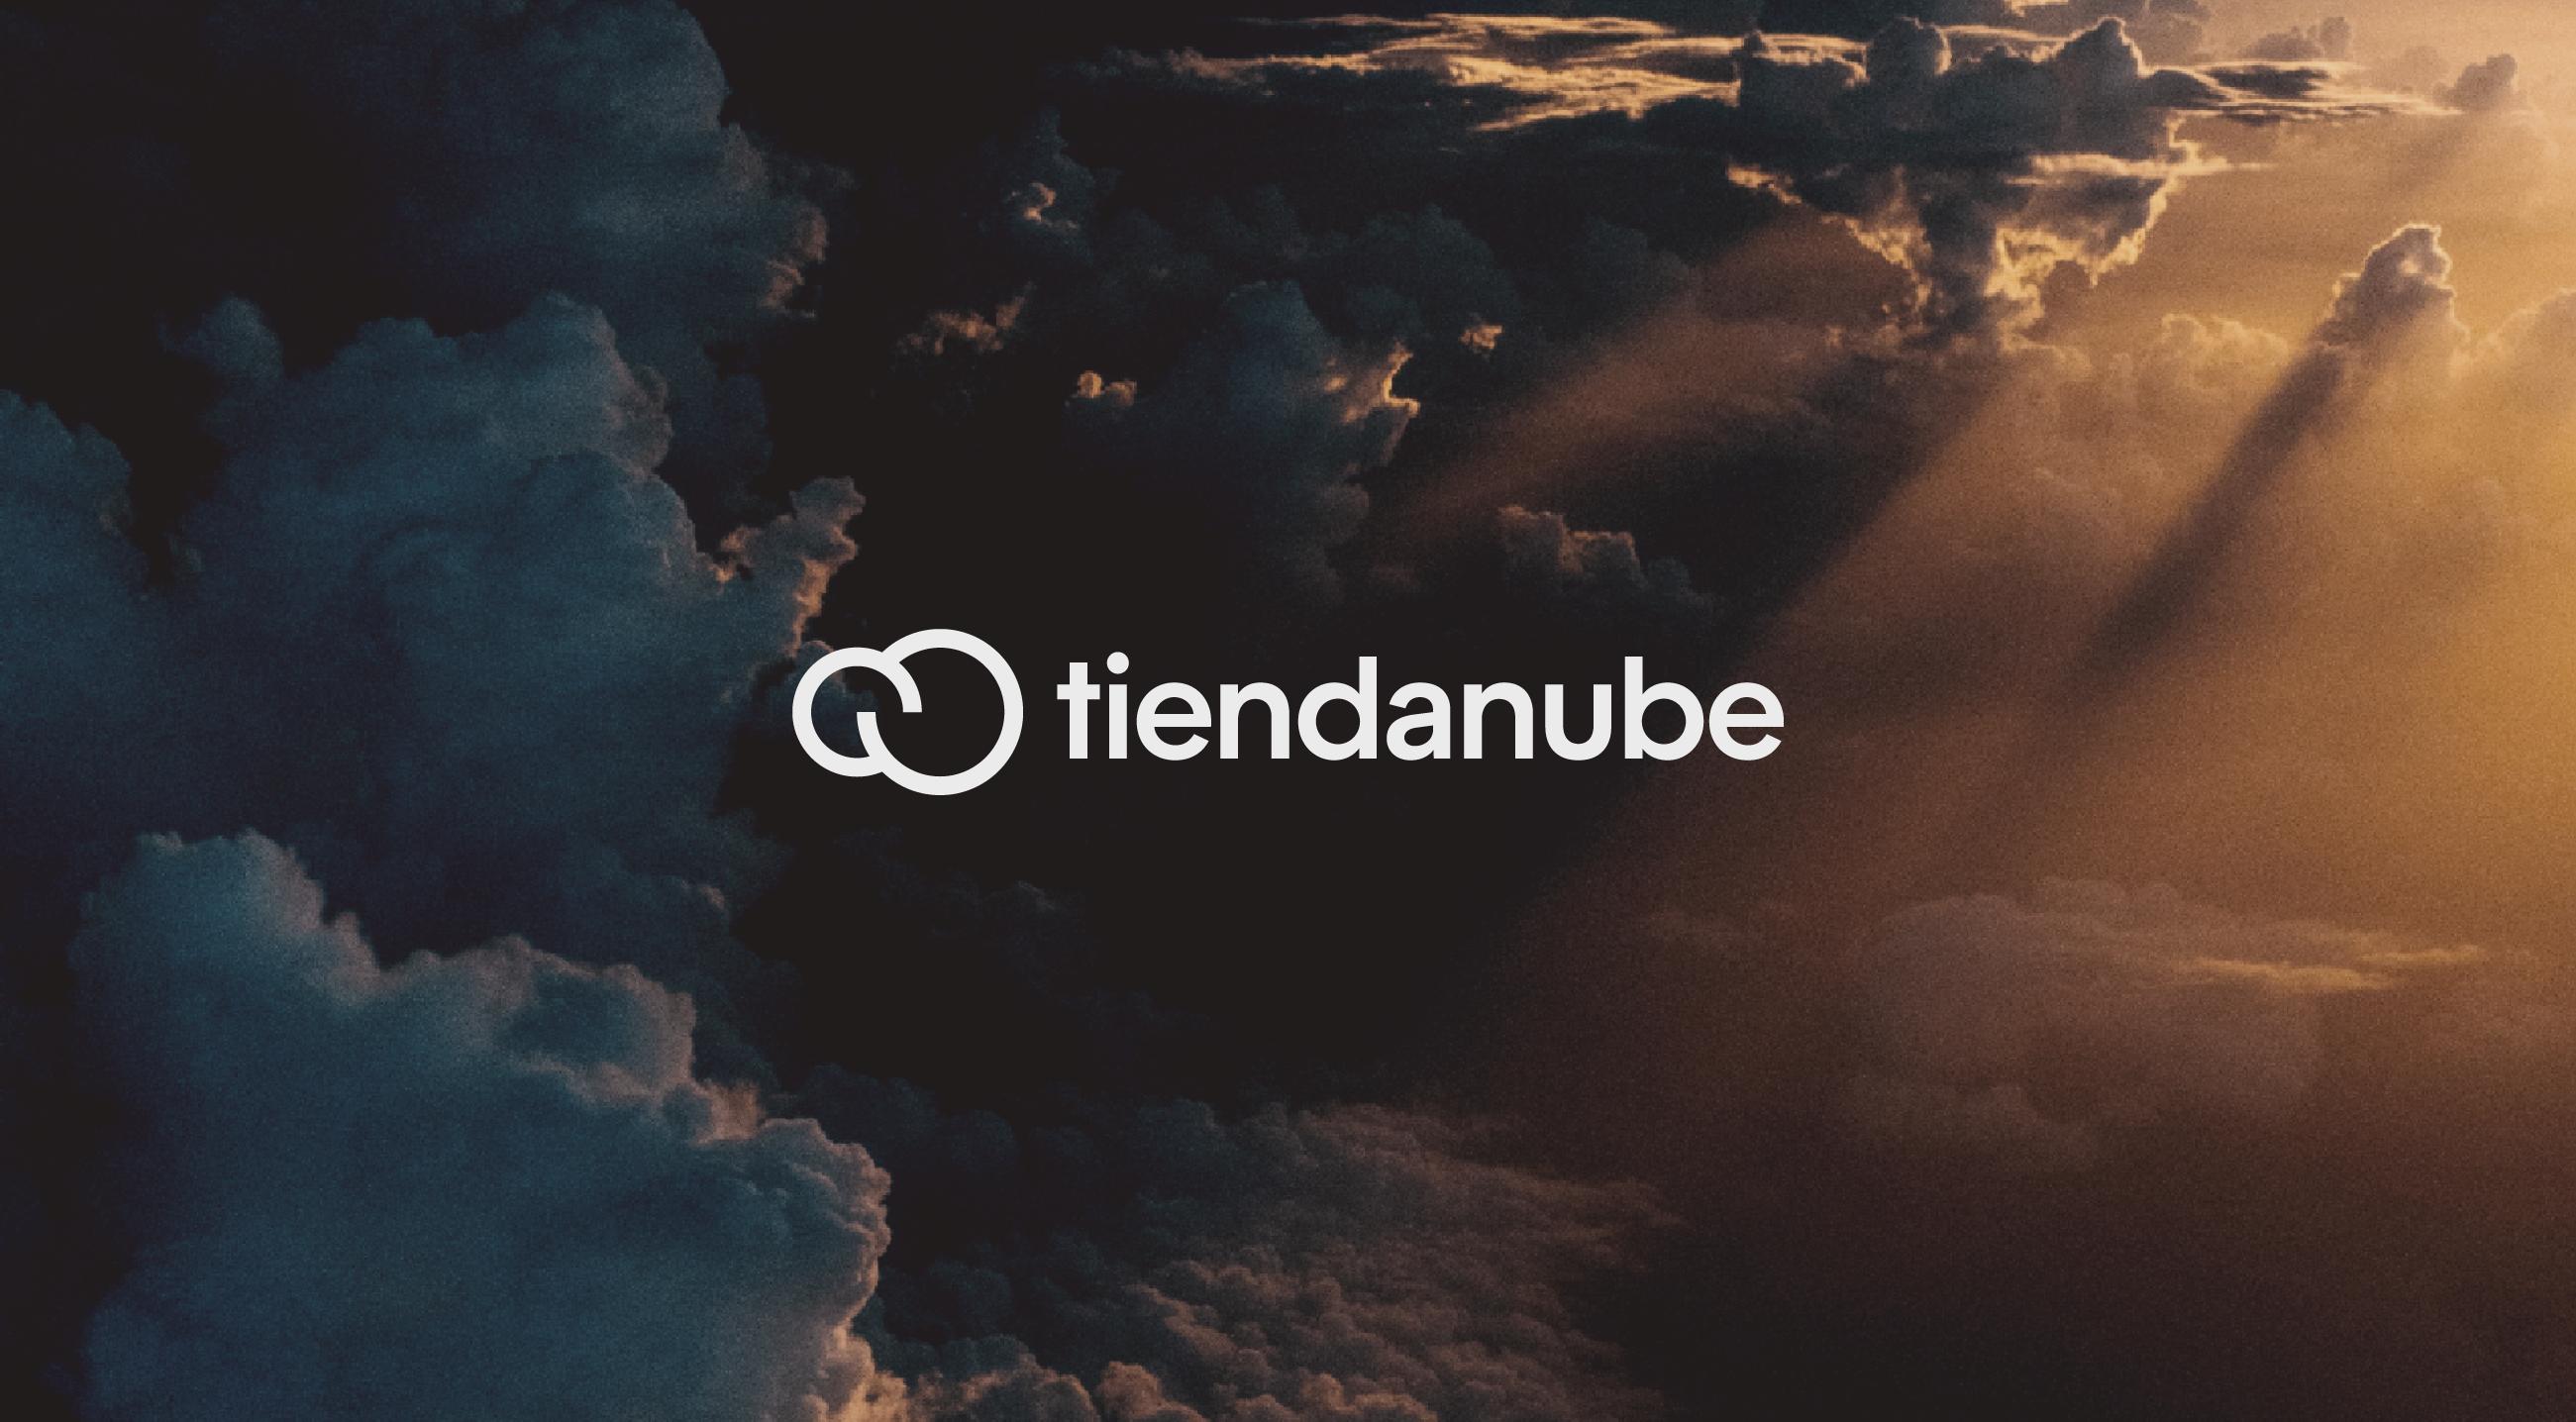 Nuevo logo Tiendanube